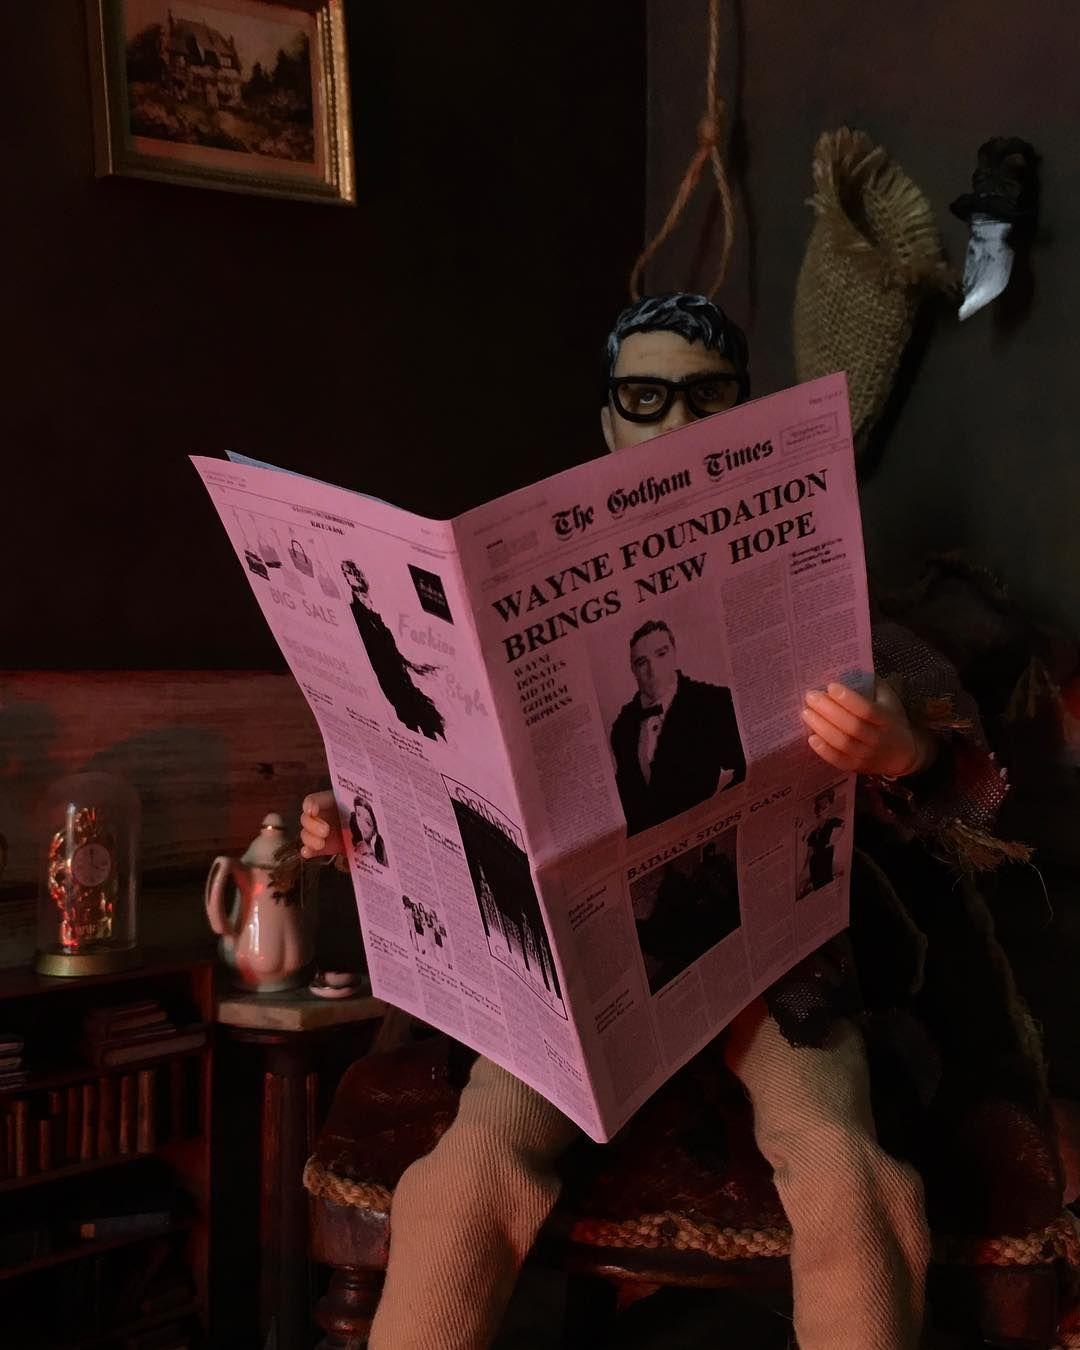 Dr Crane isnt here right now...#scarecrow #drjonathancrane #jonathancrane #DC #DCU #batman #gotham #arkhamasylum #roguesgallery #doll #mattel #matteldoll #kendoll #barbie #customdoll #ooak #barbiedoll